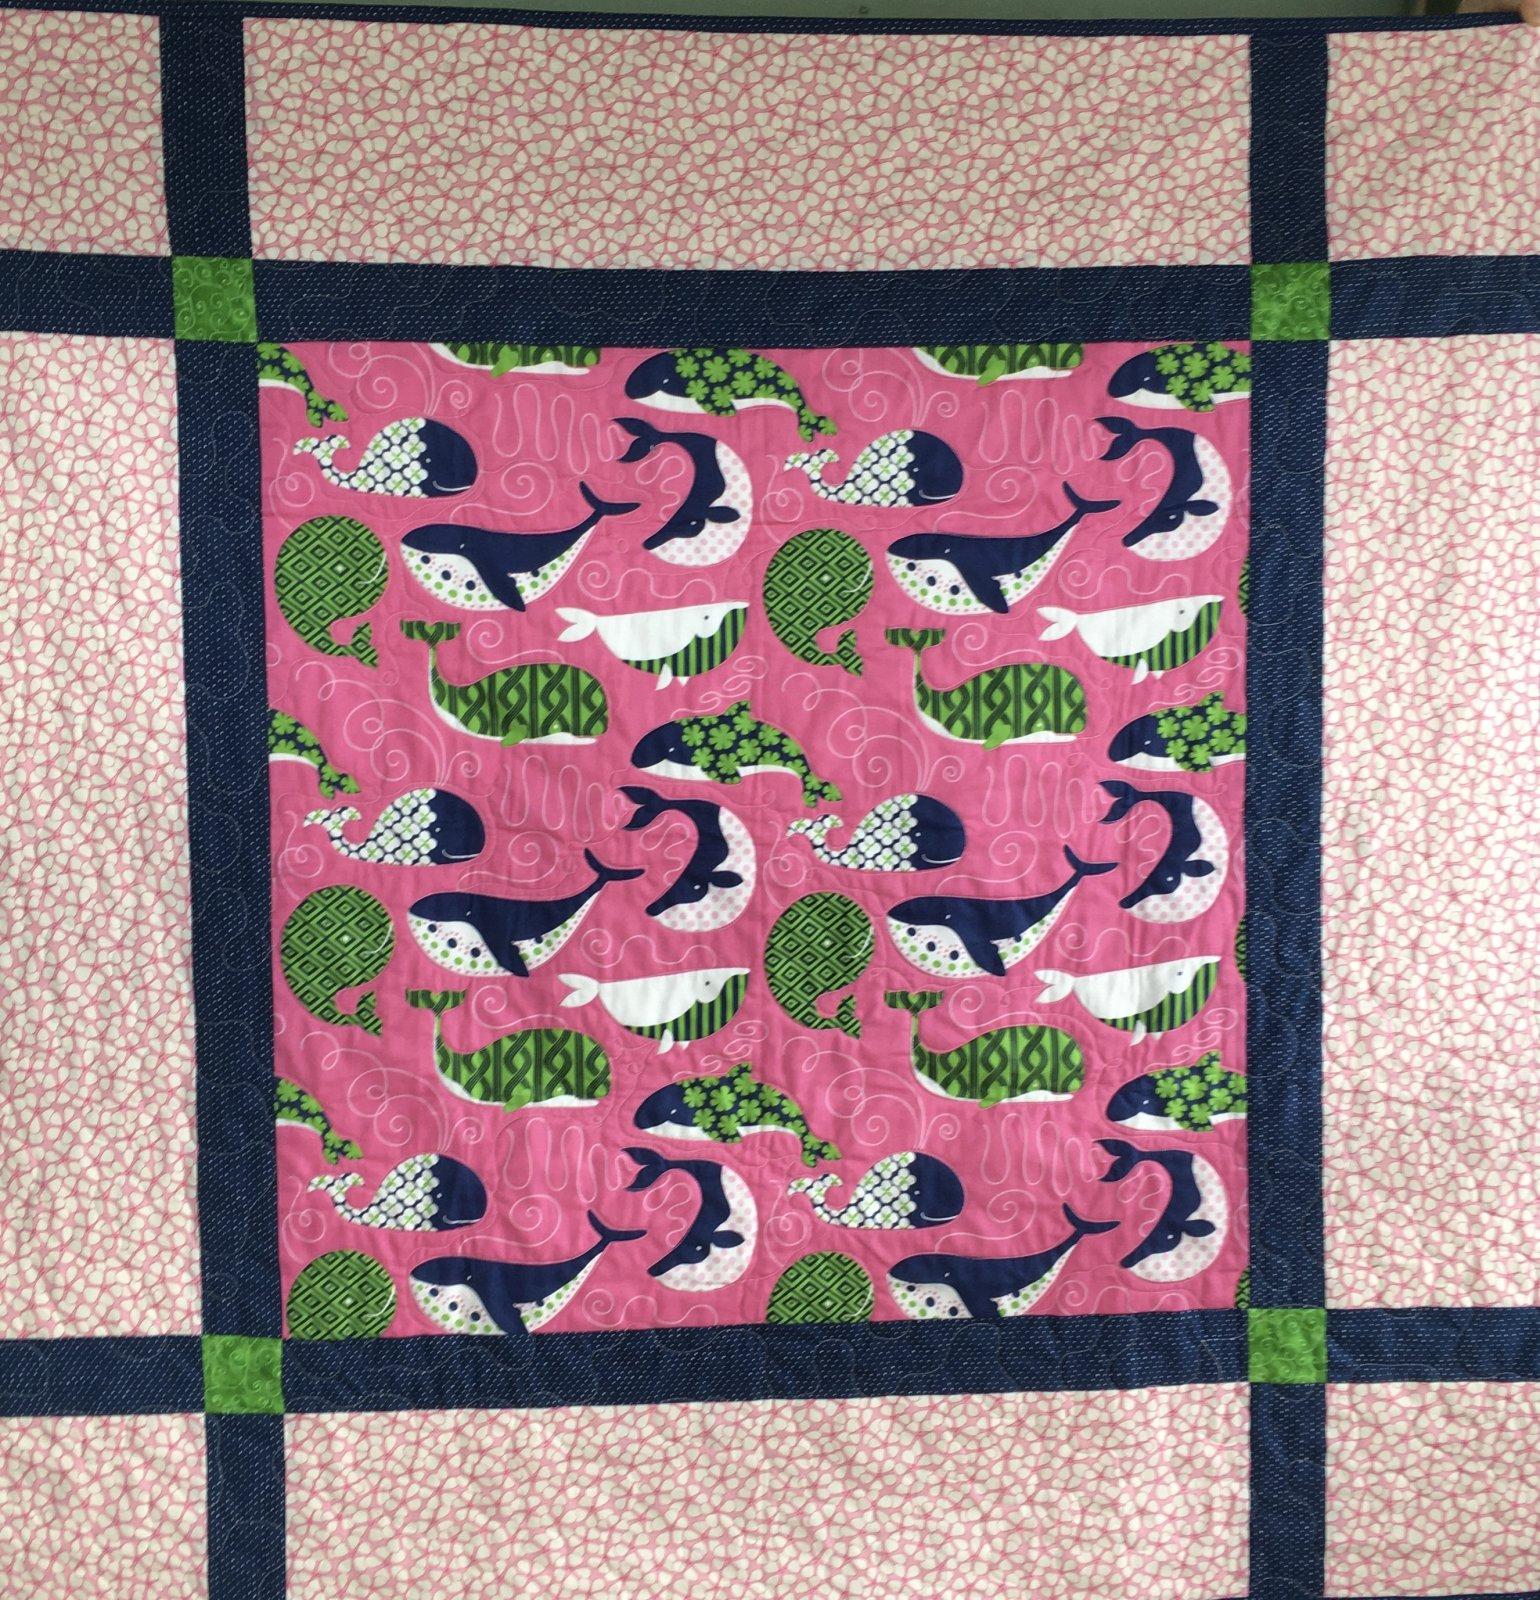 Whale Quilt 52 x 52